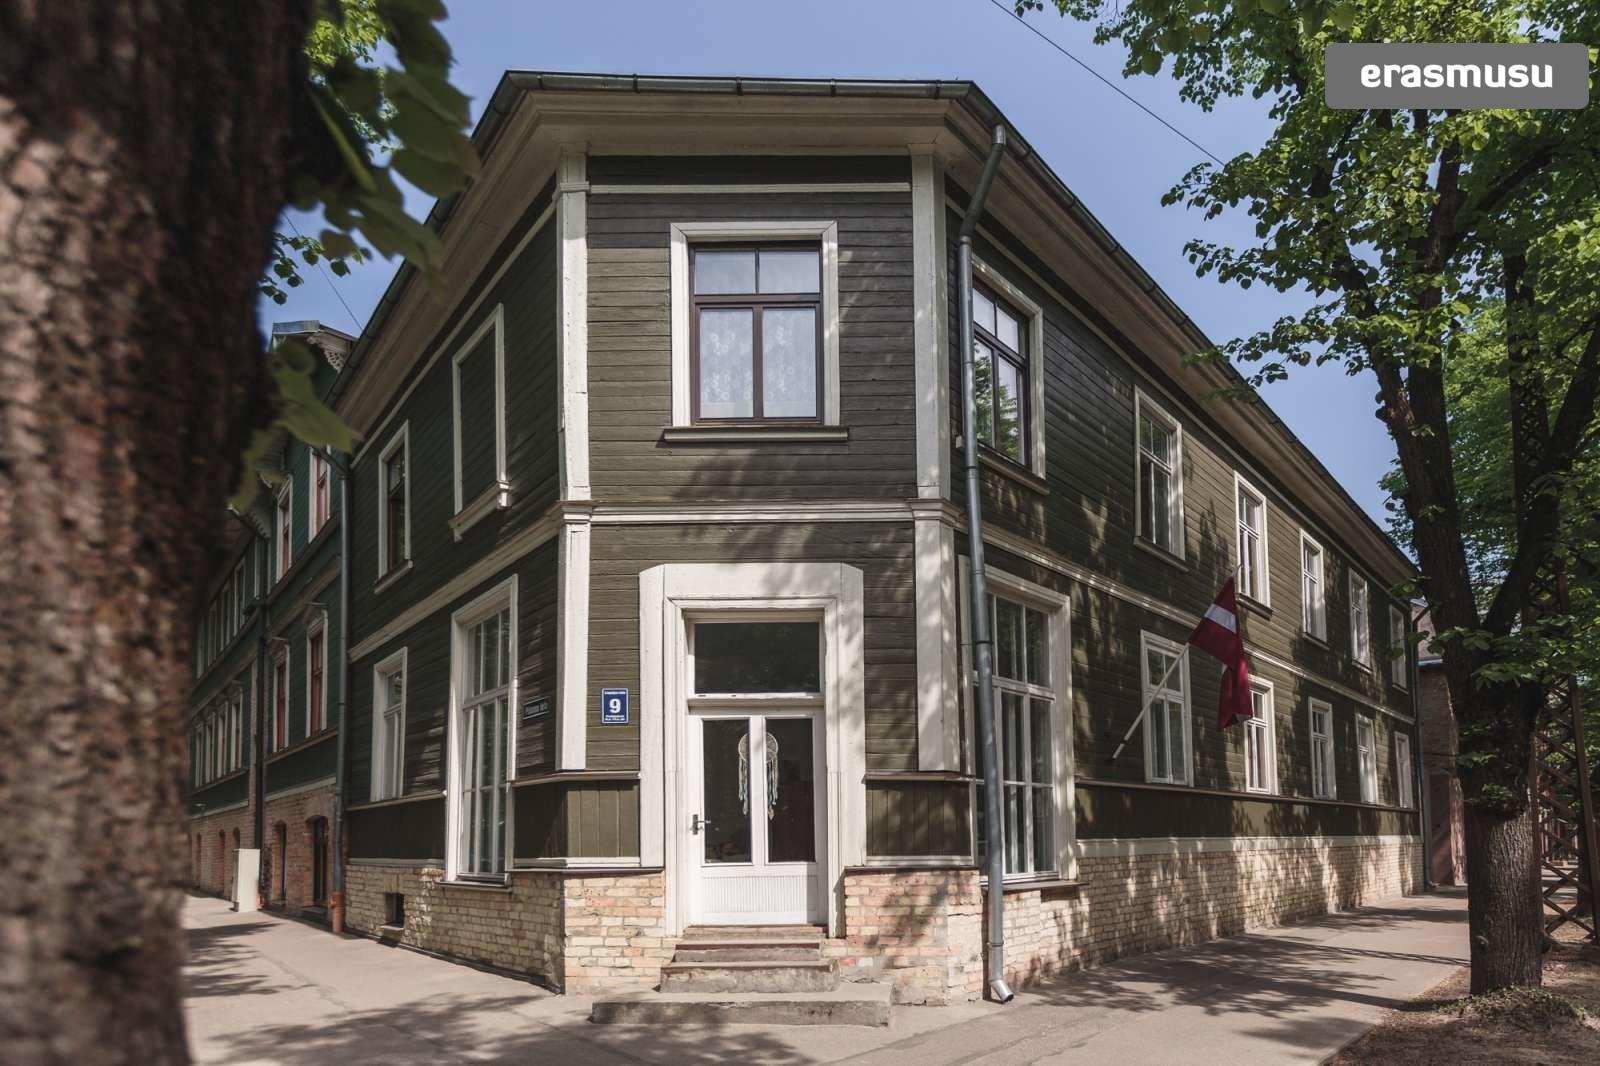 charming-studio-apartment-rent-agenskalns-pet-friendly-ba50e1c6c